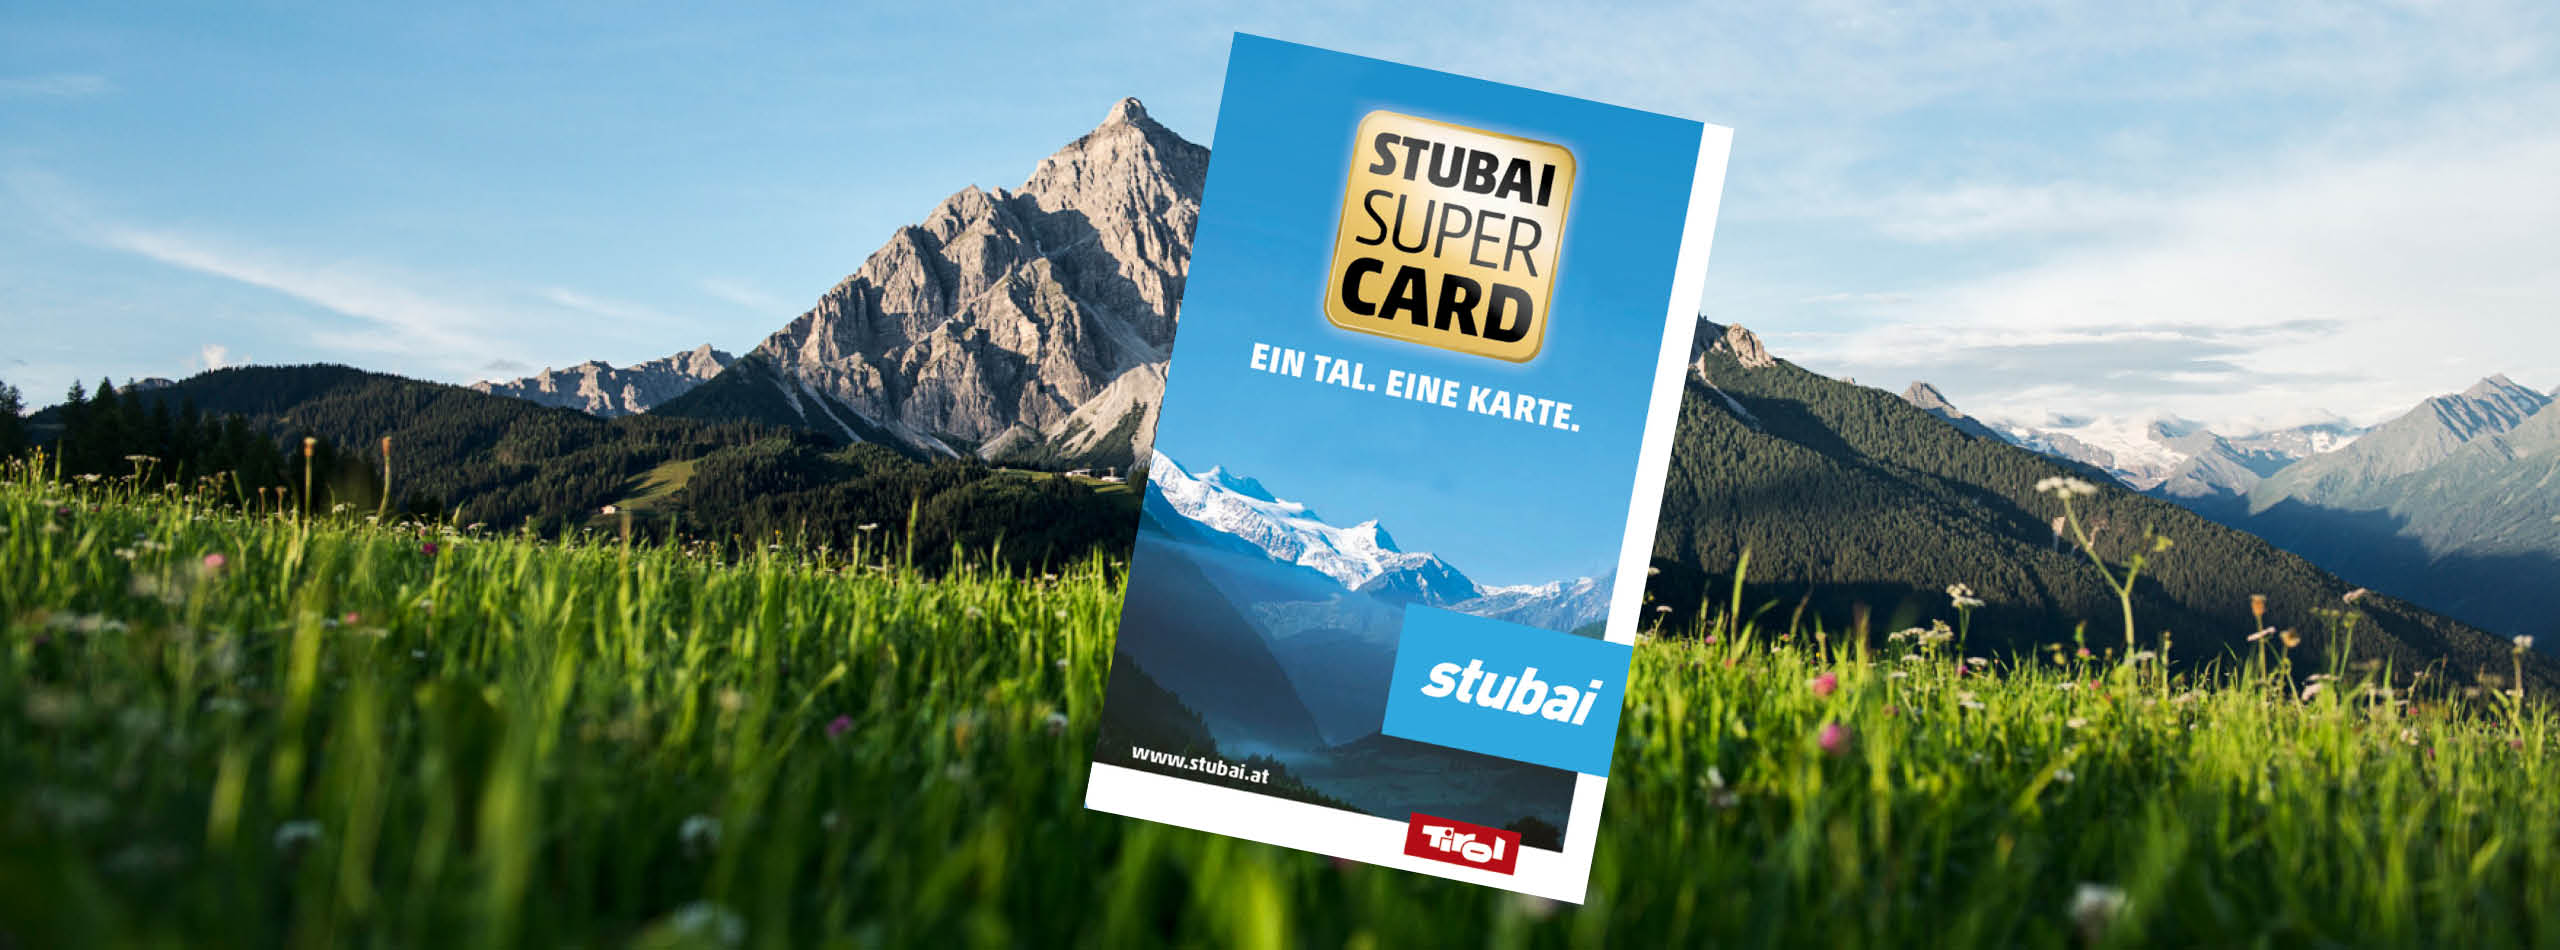 Stubai Super Card - Happy Stubai Hotel Neustift Tirol Hostel